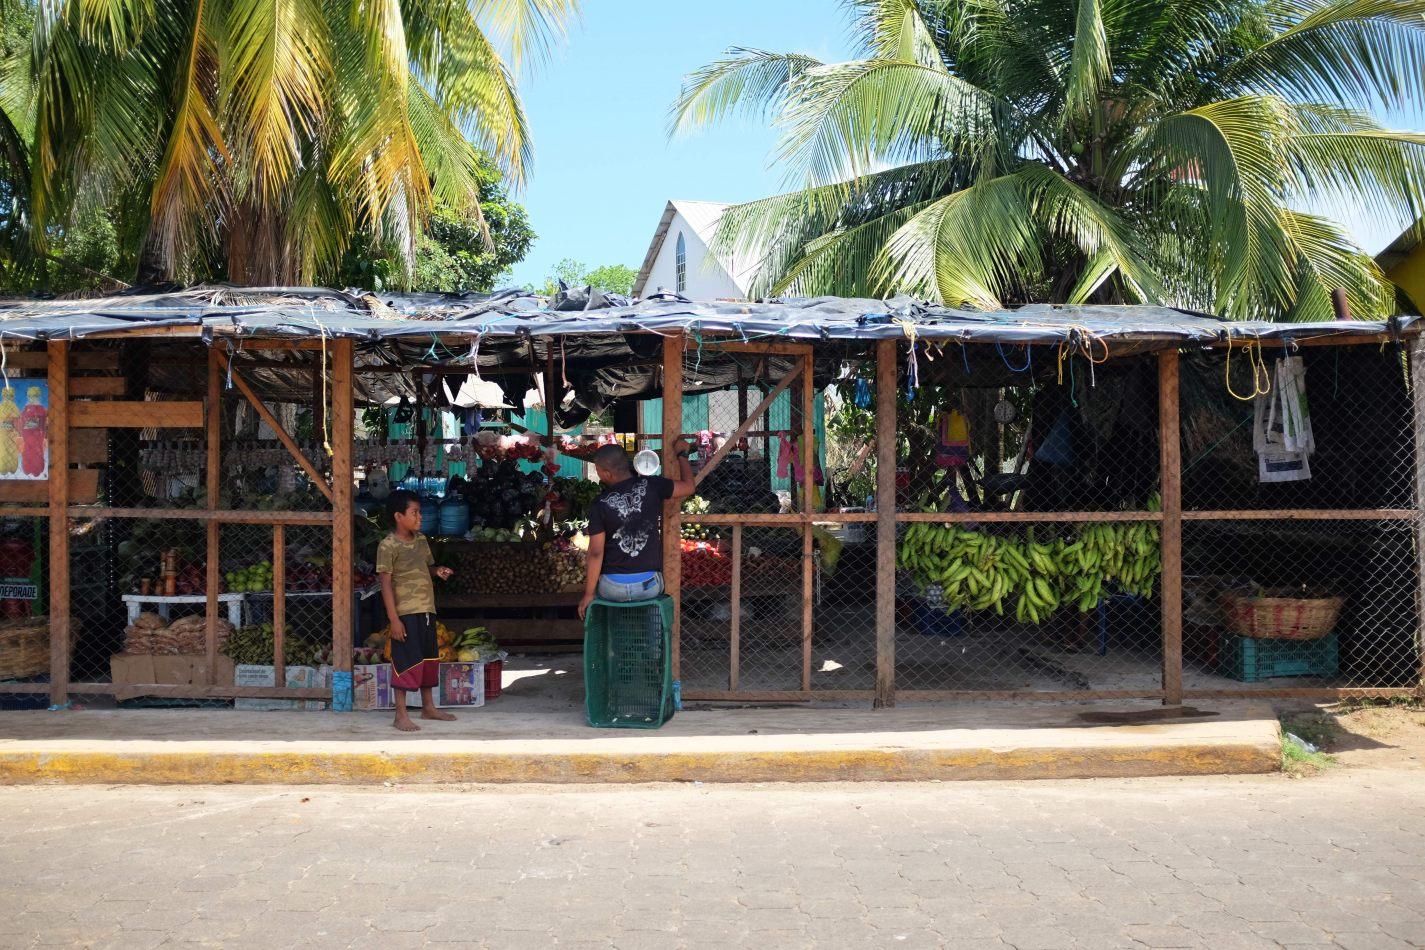 Hibiscus & Nomada : Corn Islands - Fruits & Vegetables